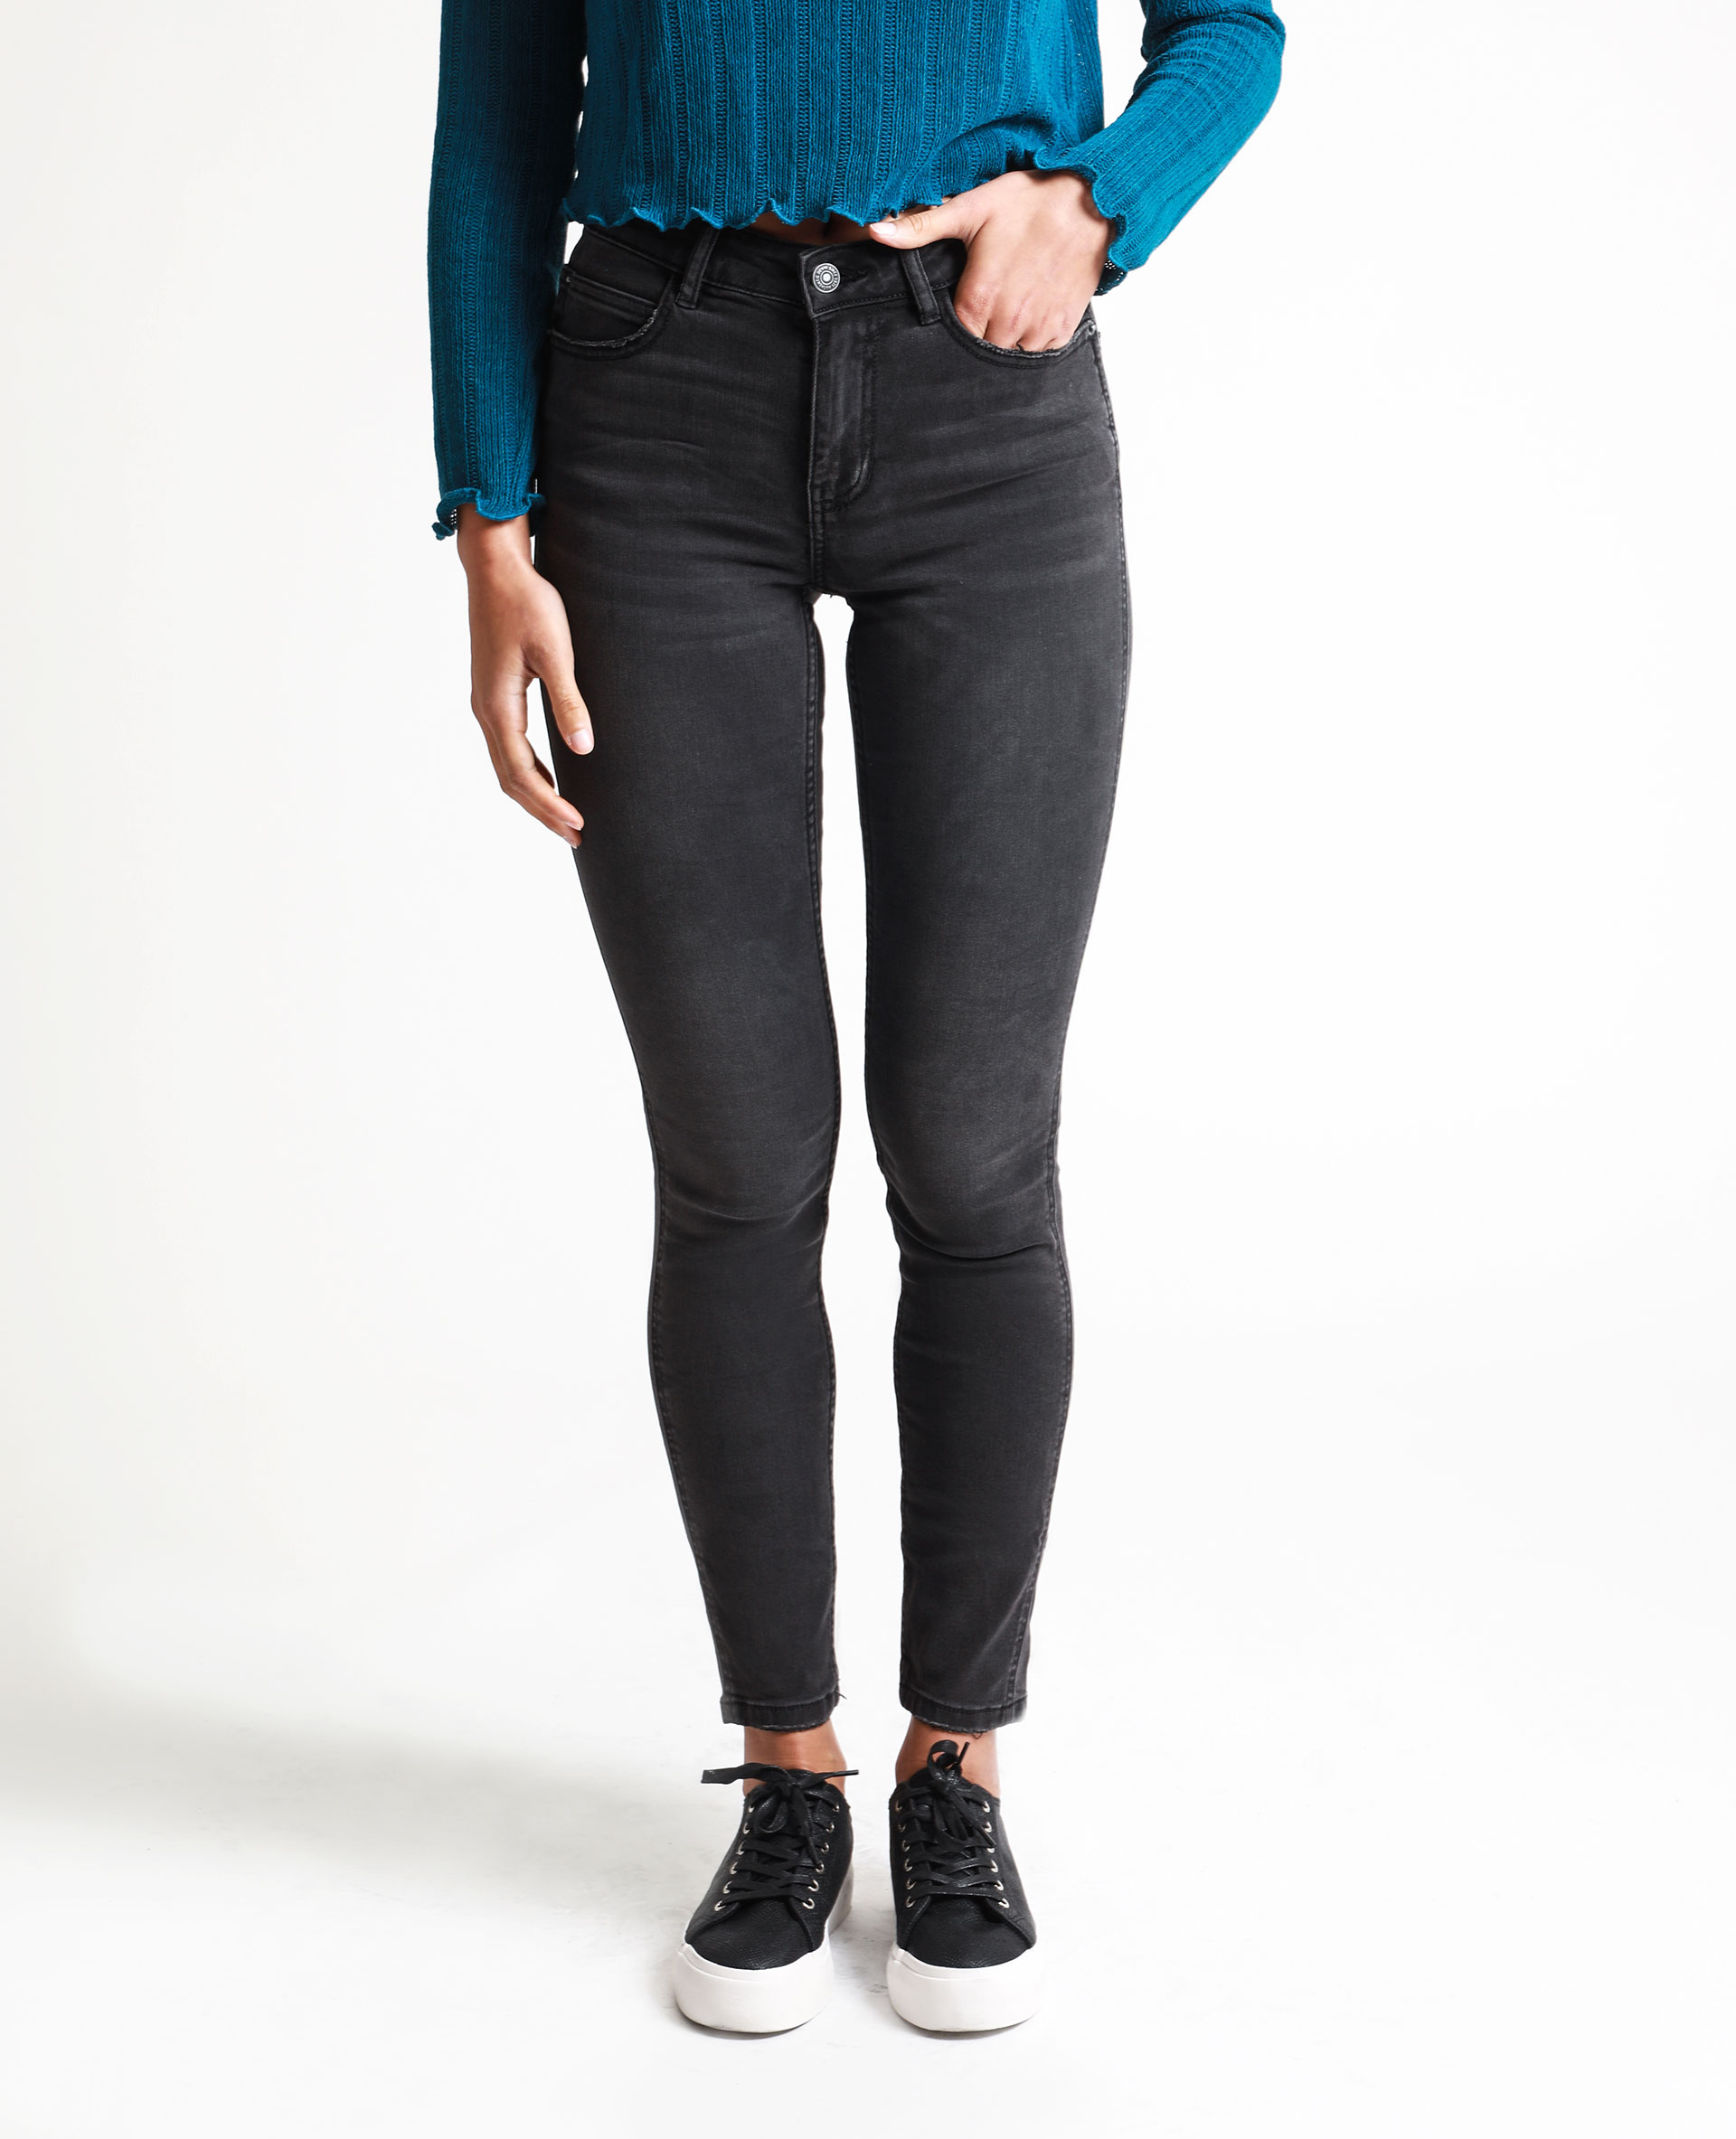 jean skinny taille haute noir 140667899a08 pimkie. Black Bedroom Furniture Sets. Home Design Ideas